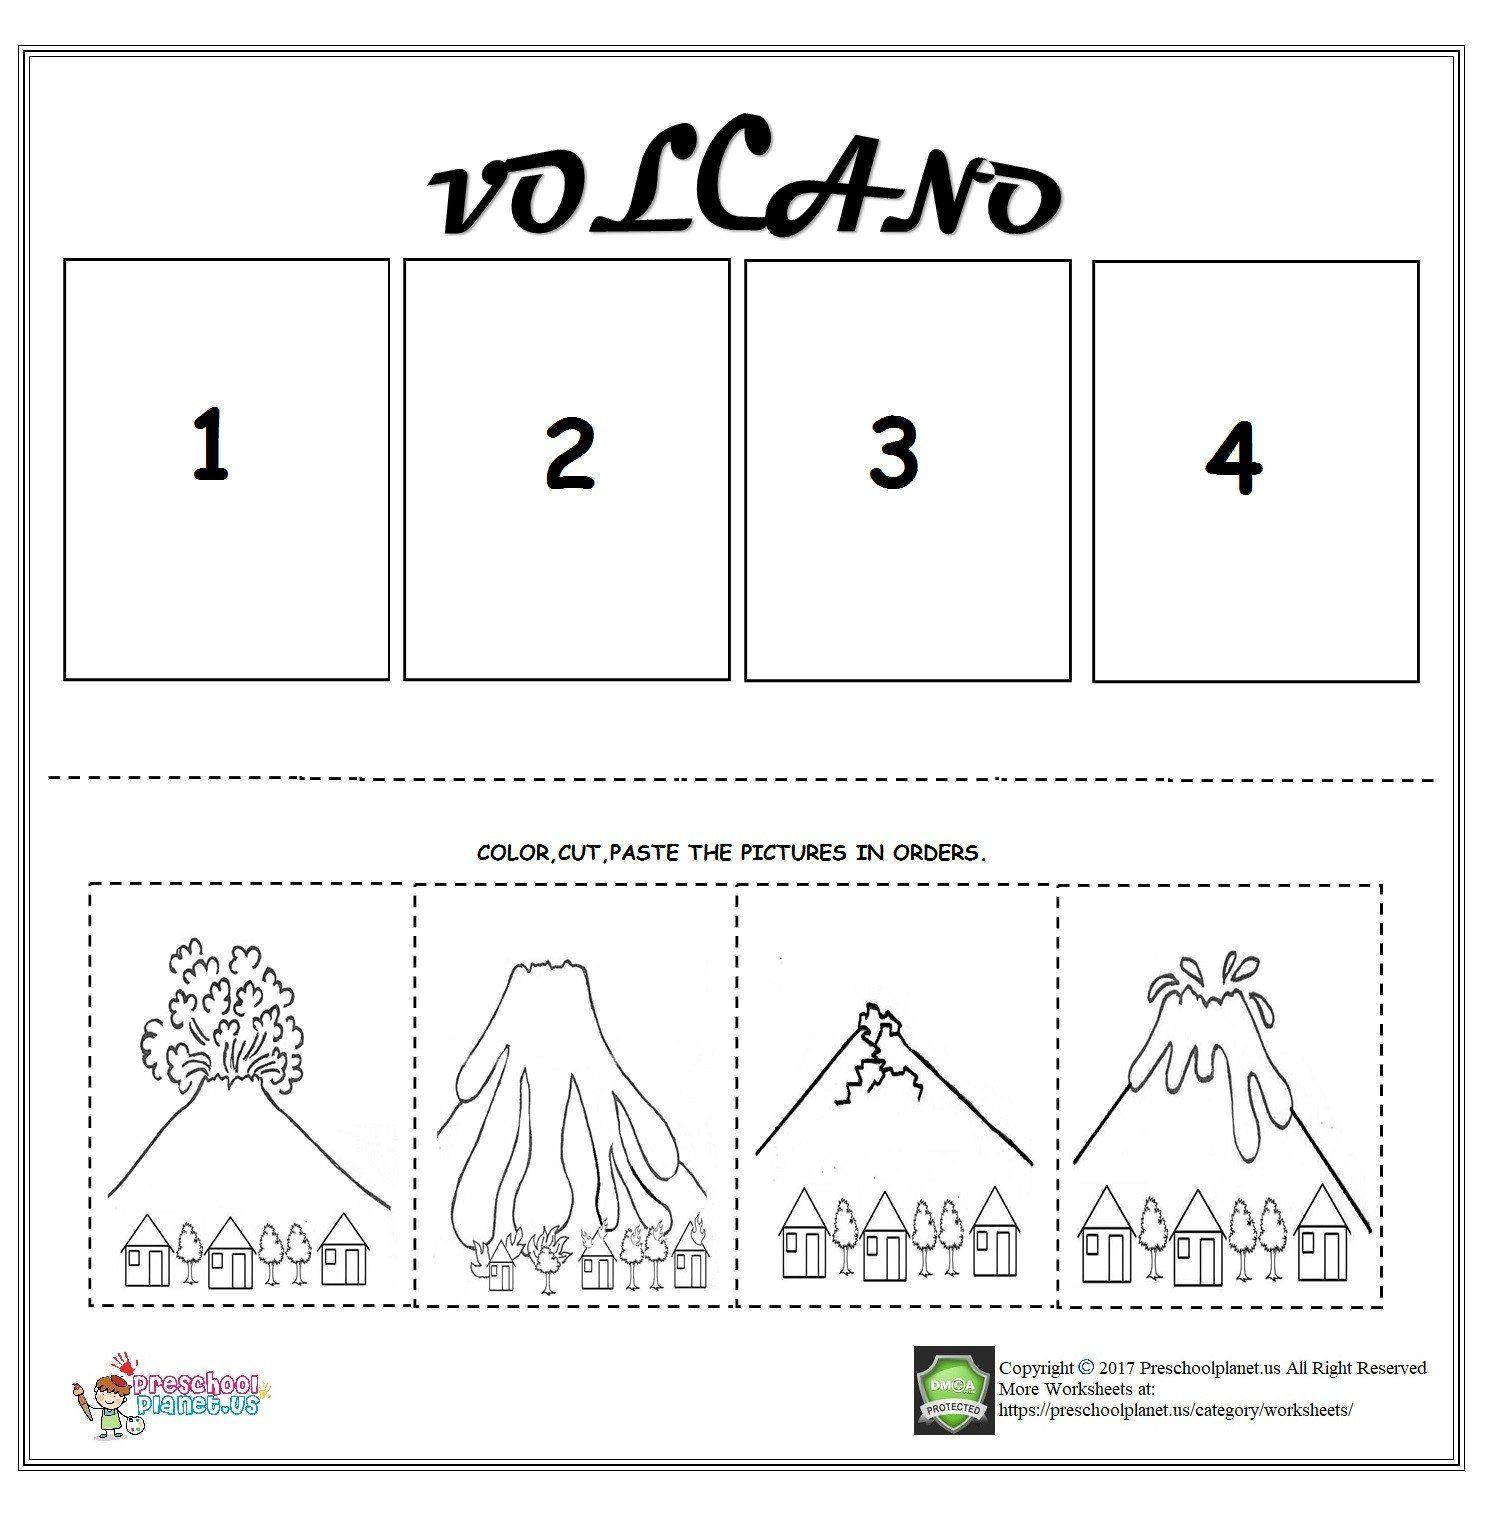 Sequence Worksheets For Kindergarten Volcano Sequencing